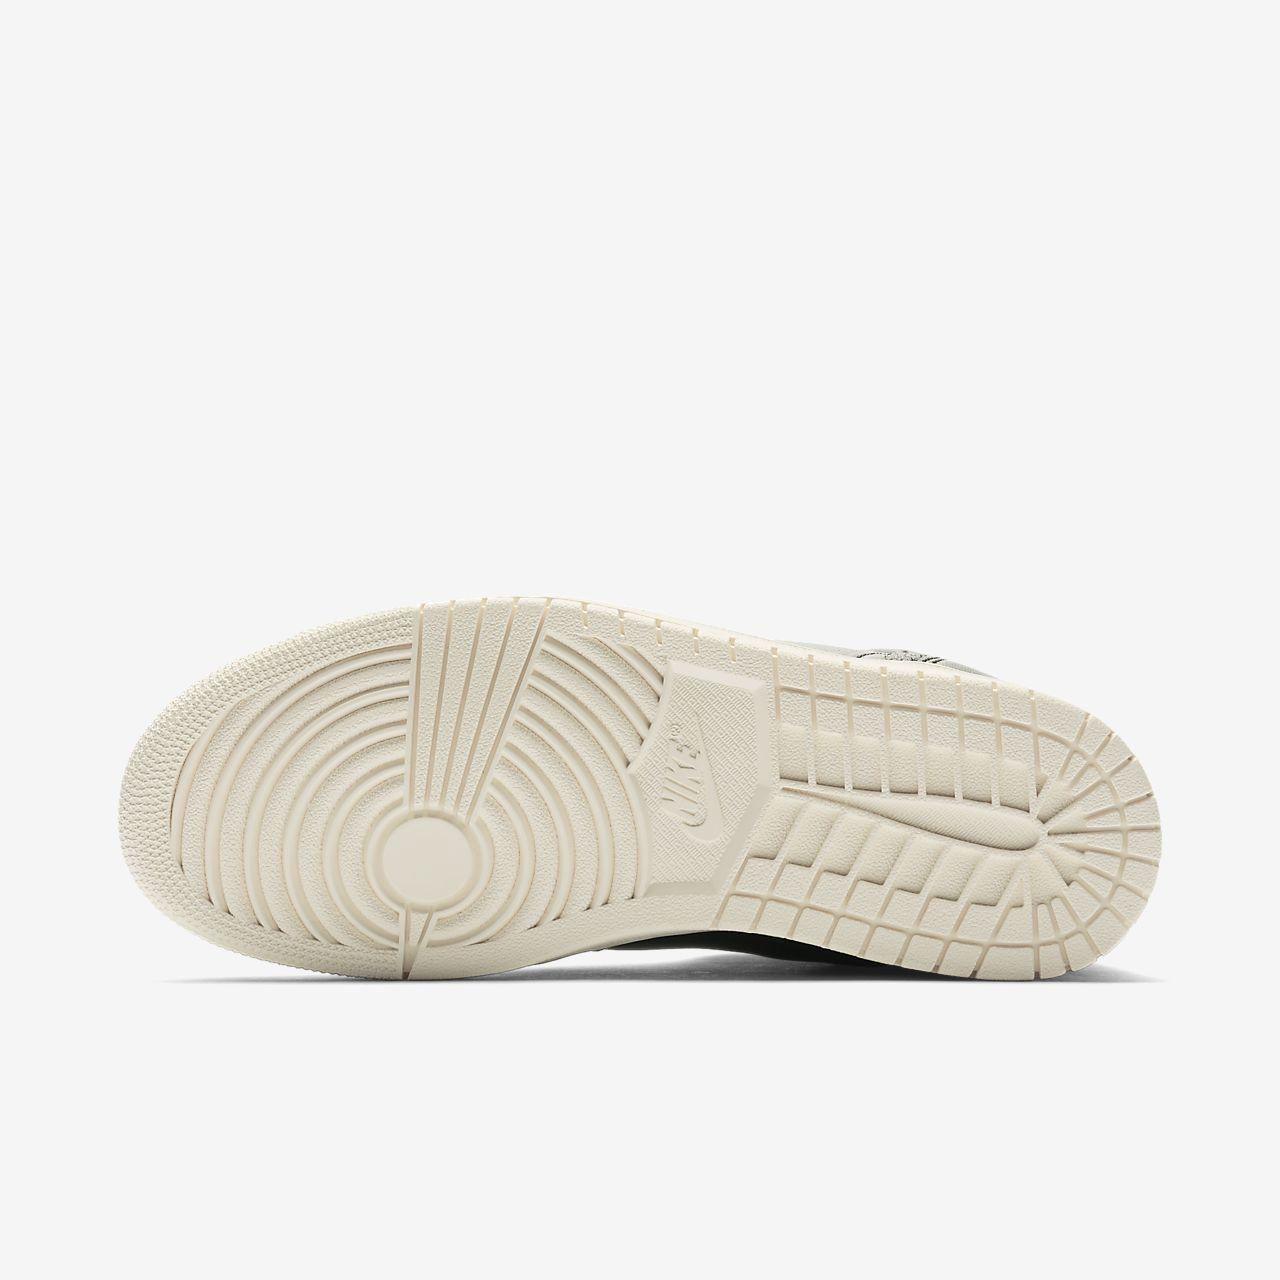 8a538a917d493f Air Jordan 1 High Zip Women s Shoe. Nike.com GB